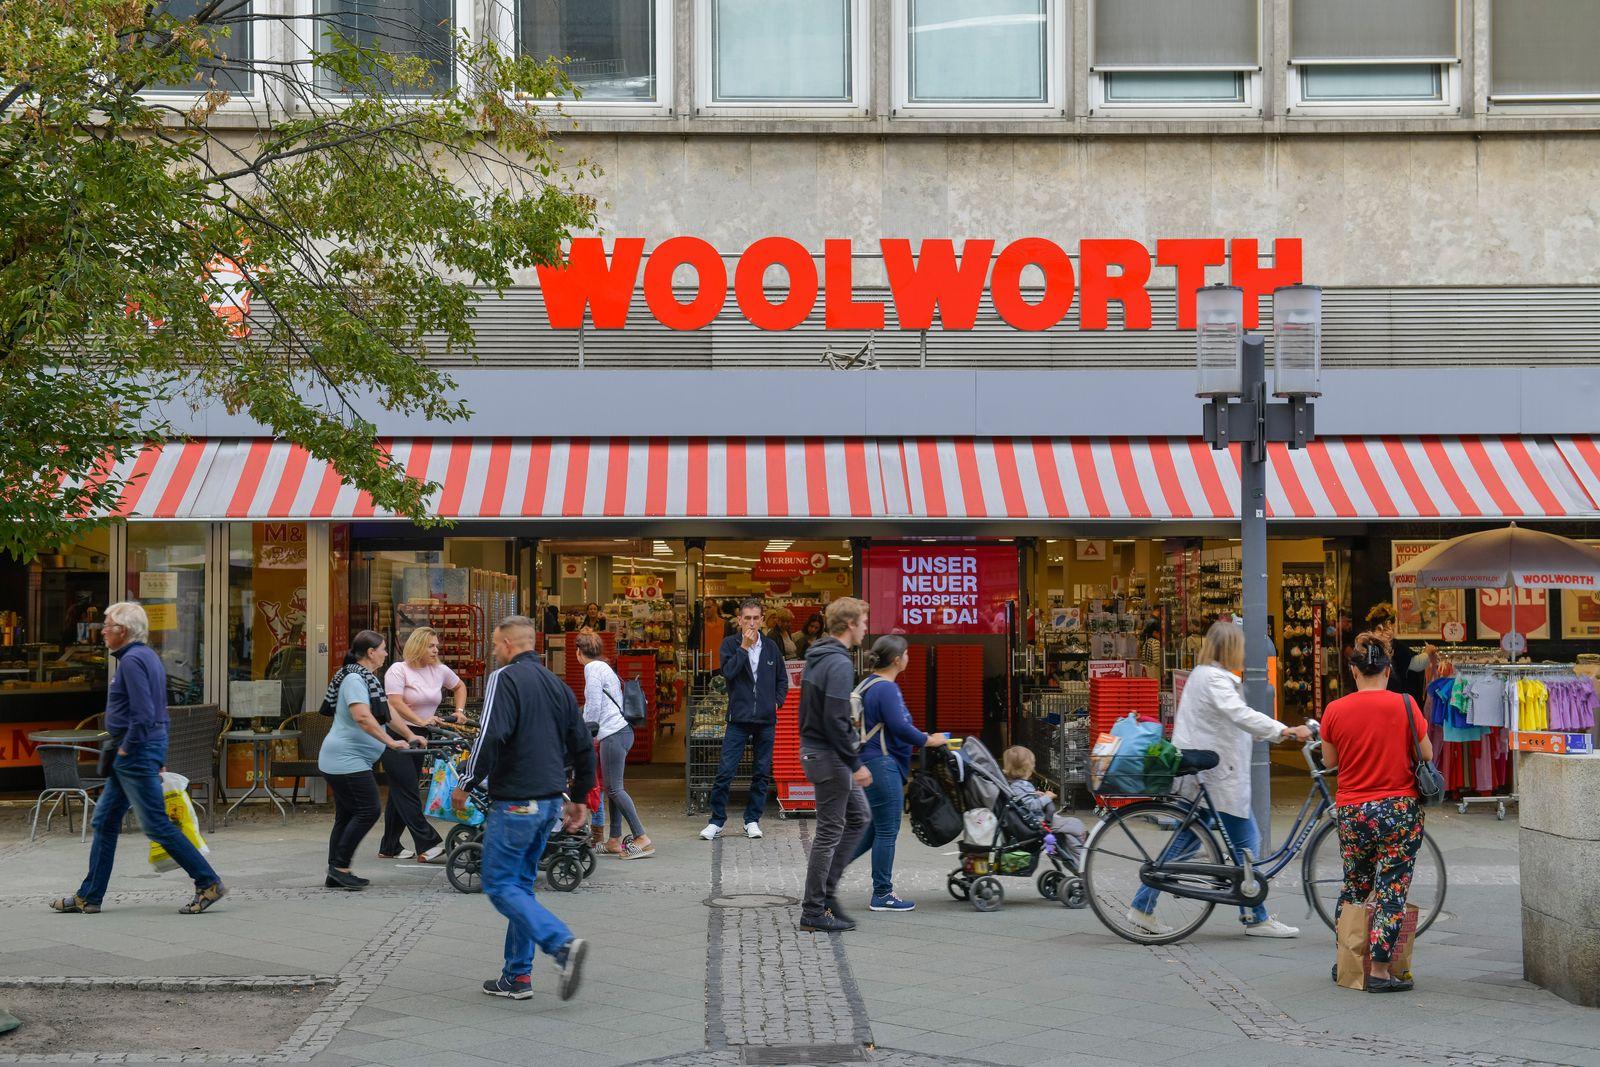 Woolworth, Wilmersdorfer Strasse, Charlottenburg, Berlin, Deutschland *** Woolworth, Wilmersdorfer Strasse, Charlottenbu